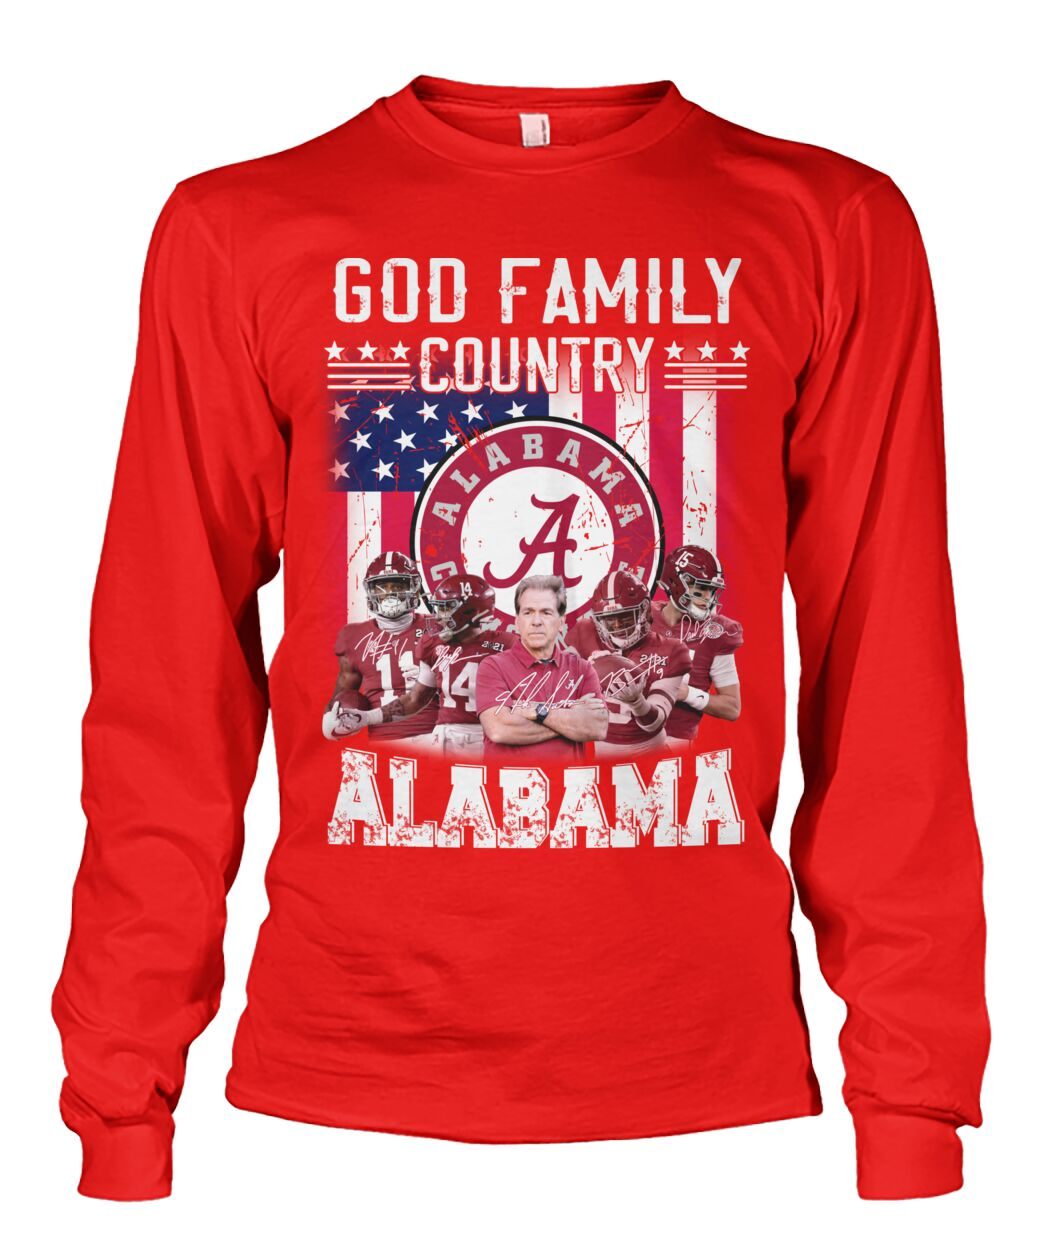 God family country Alabama crimson tide american flag long sleeve